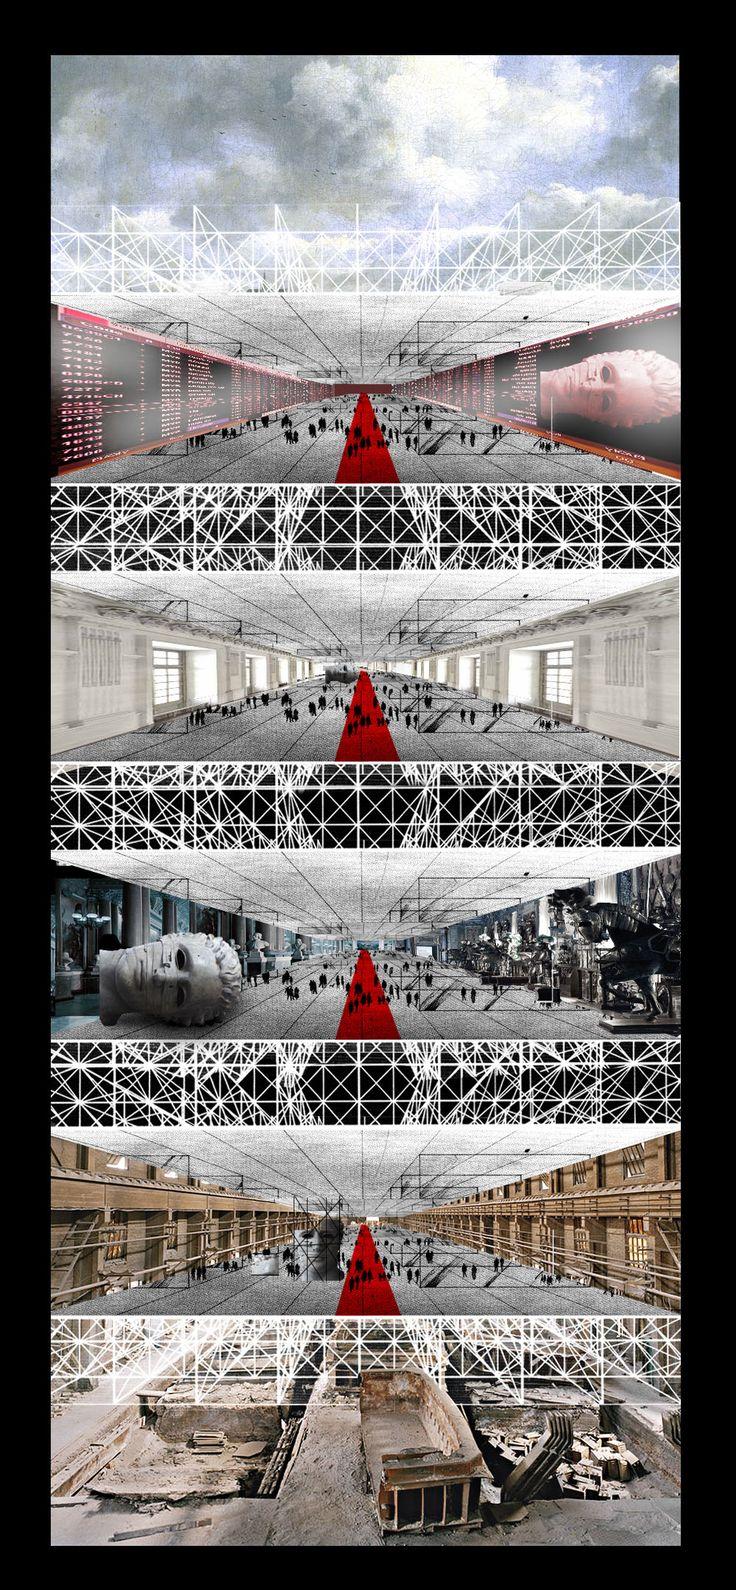 AA School of Architecture 2013 - Intermediate 7 - Jesper Victor Henriksson